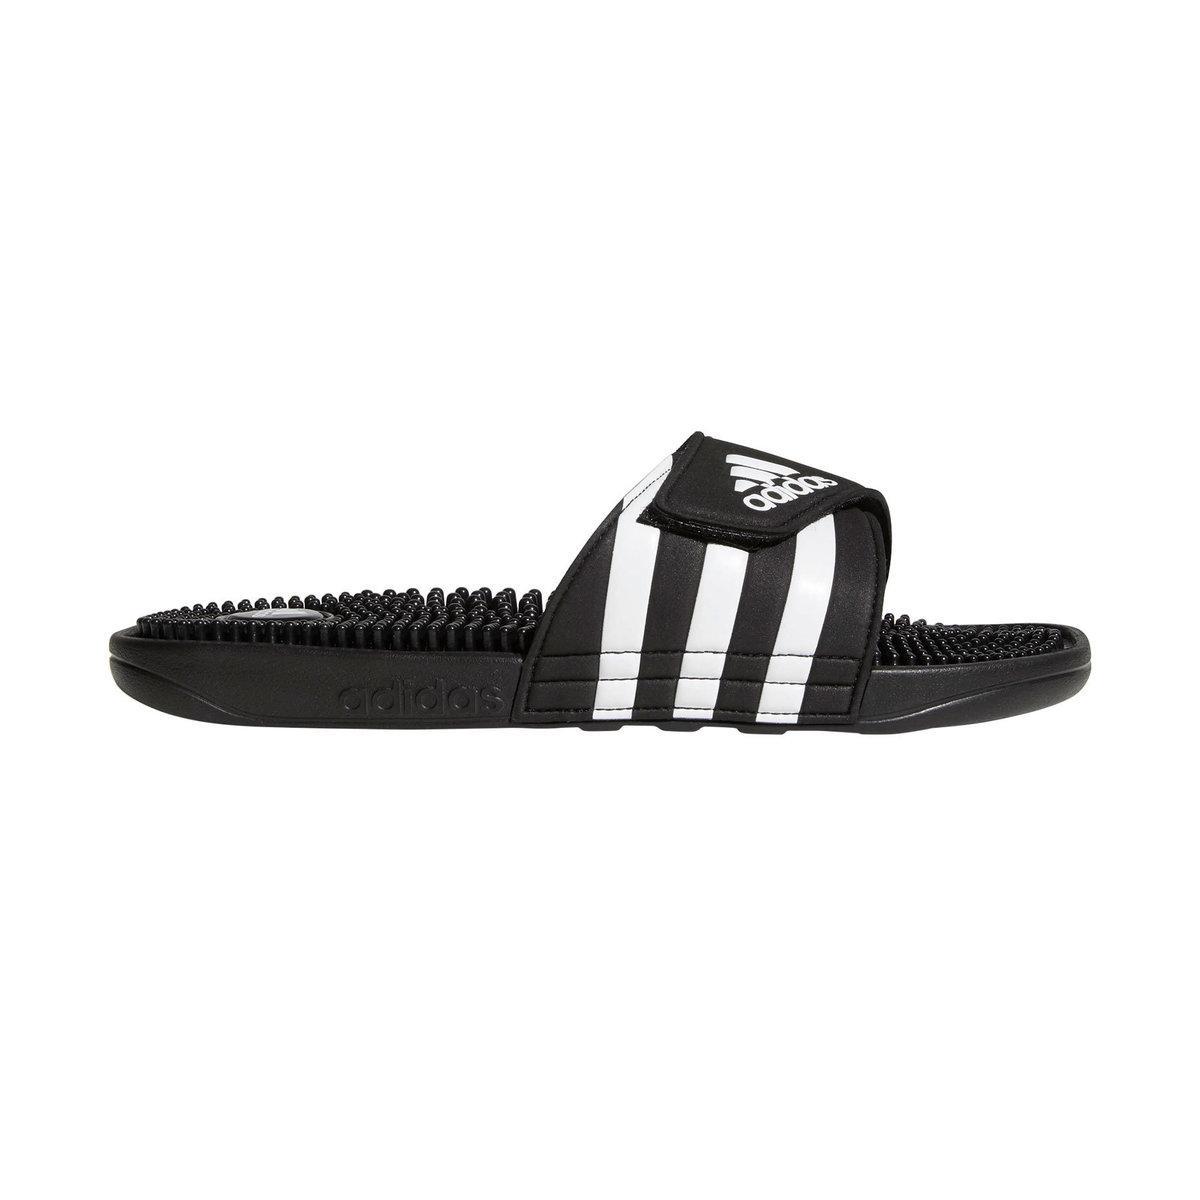 ba9321ec0461 Lyst - Adidas Adissage Slides – Mens in Black for Men